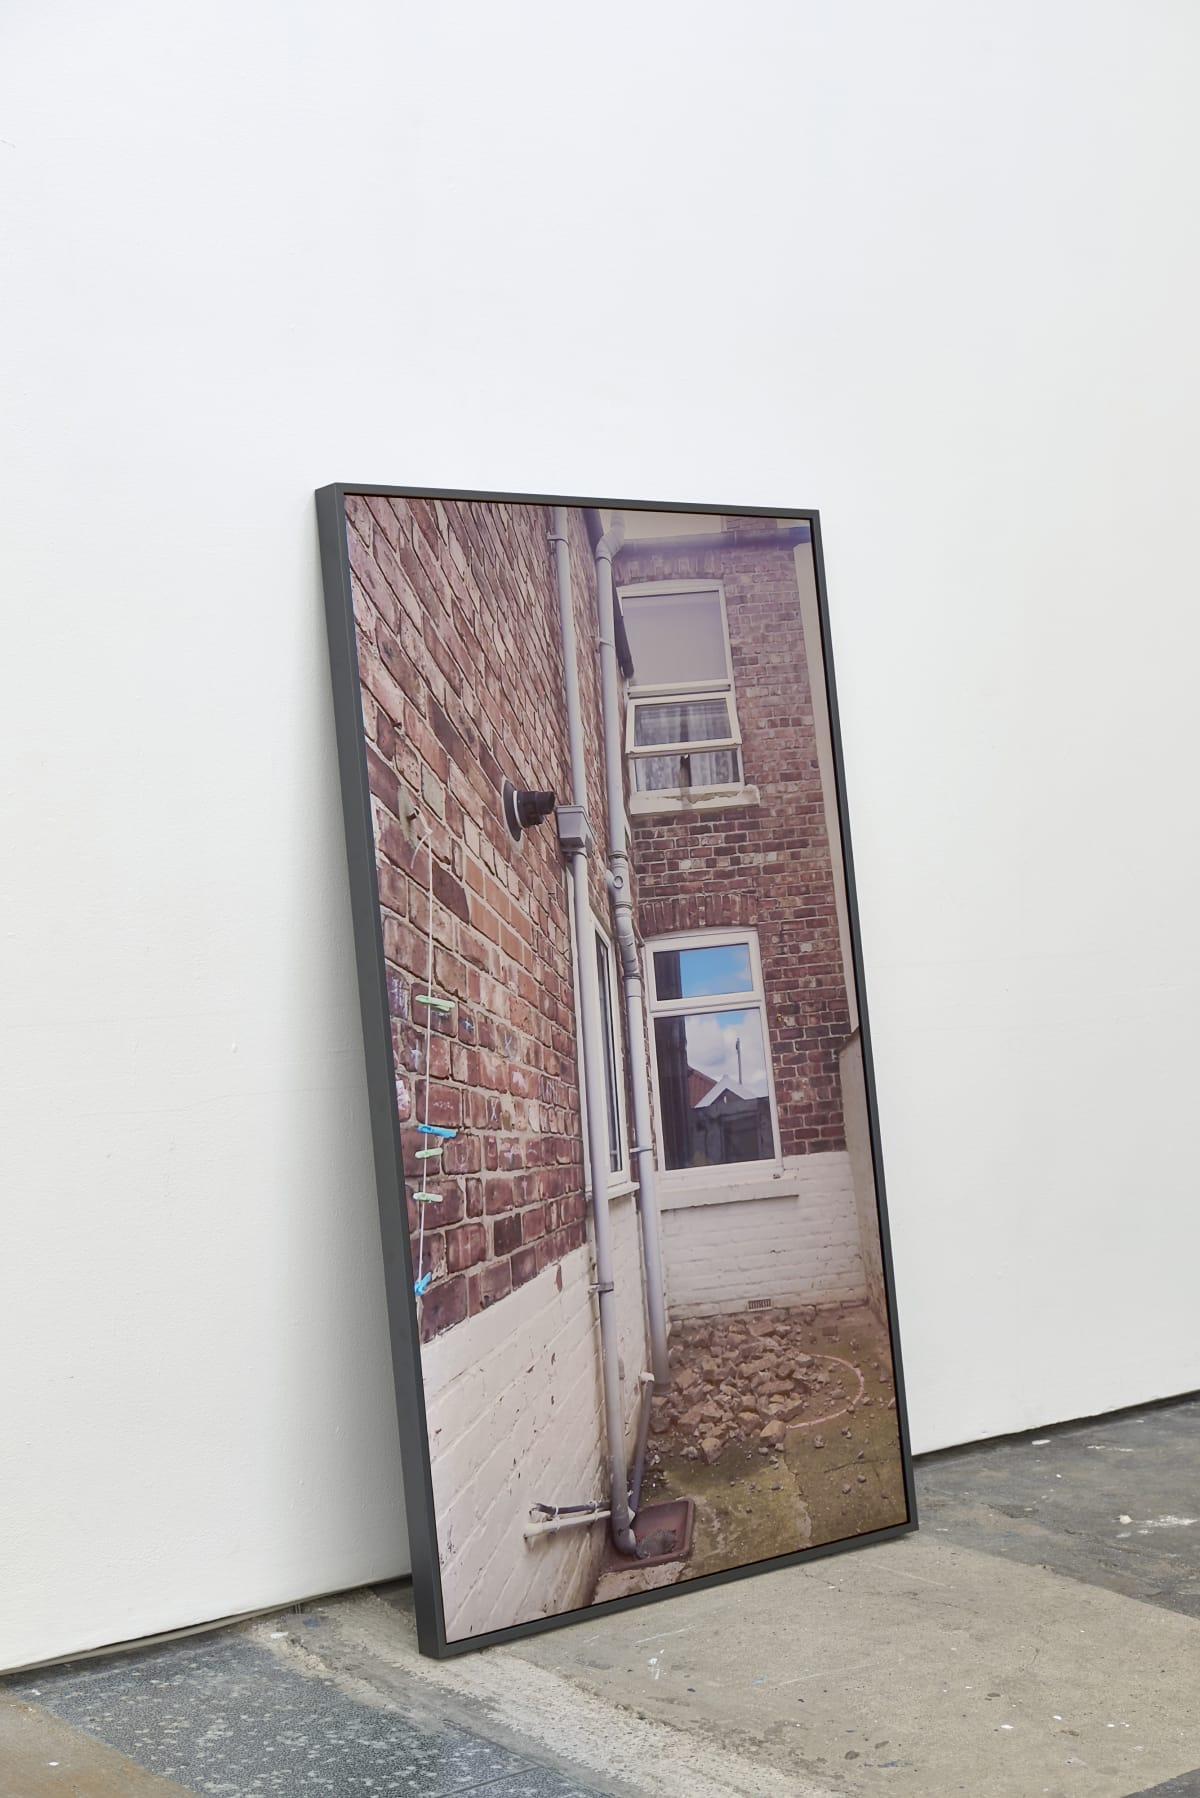 Emily Hesse, No Equivalent, 2018